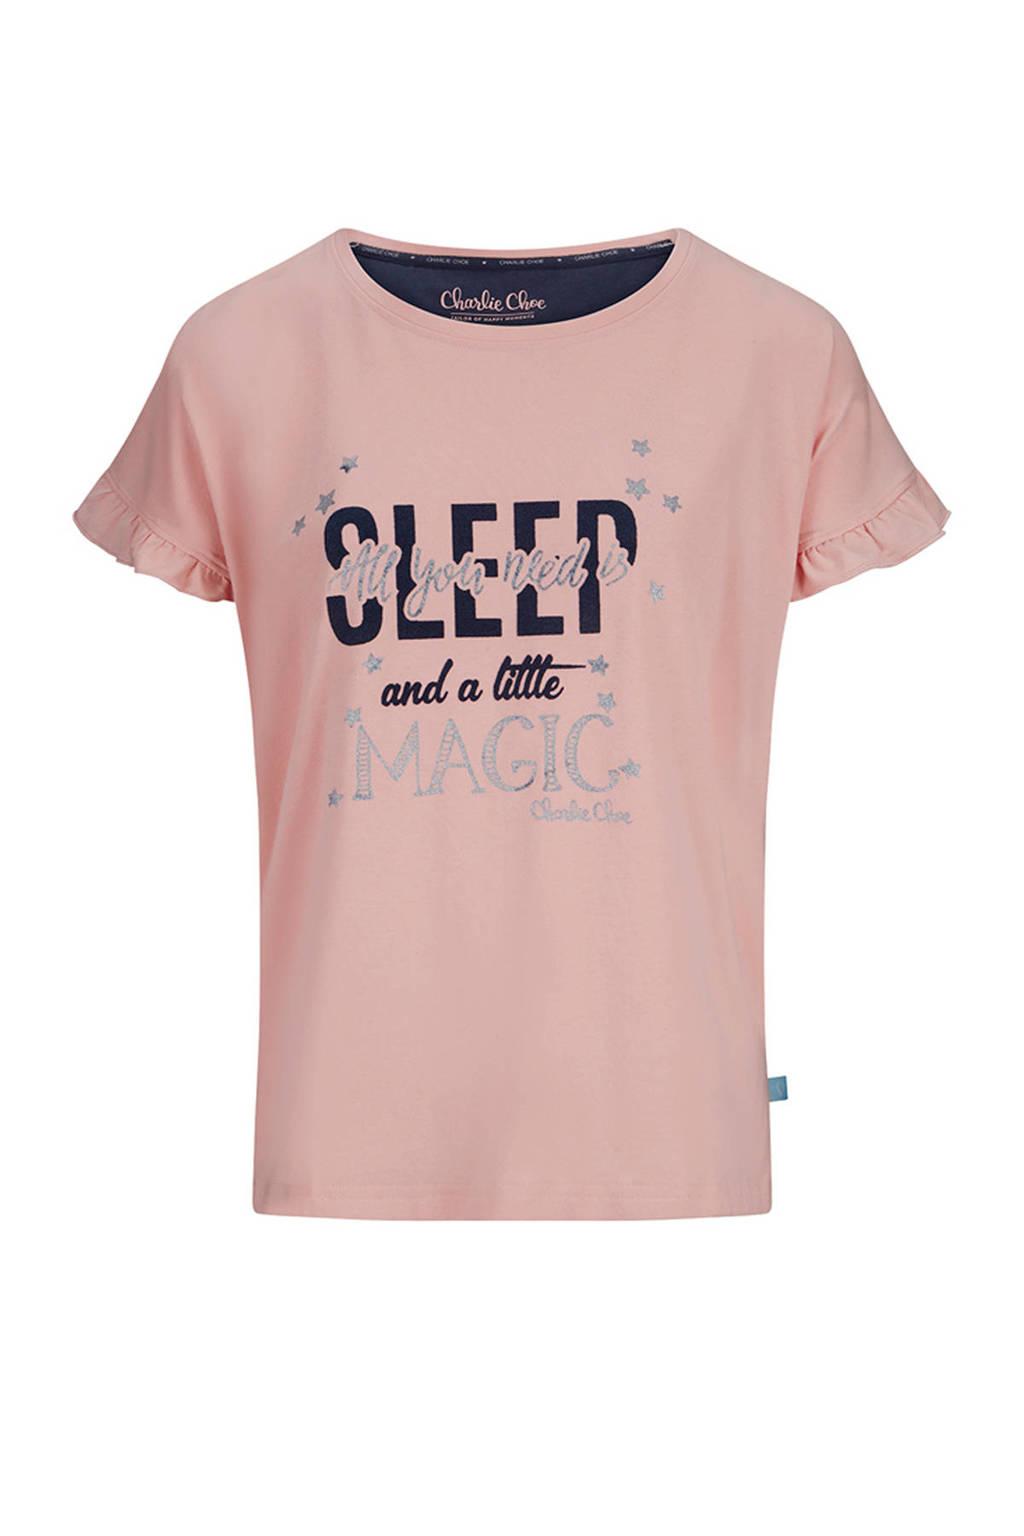 Charlie Choe pyjamatop met printopdruk roze, Roze